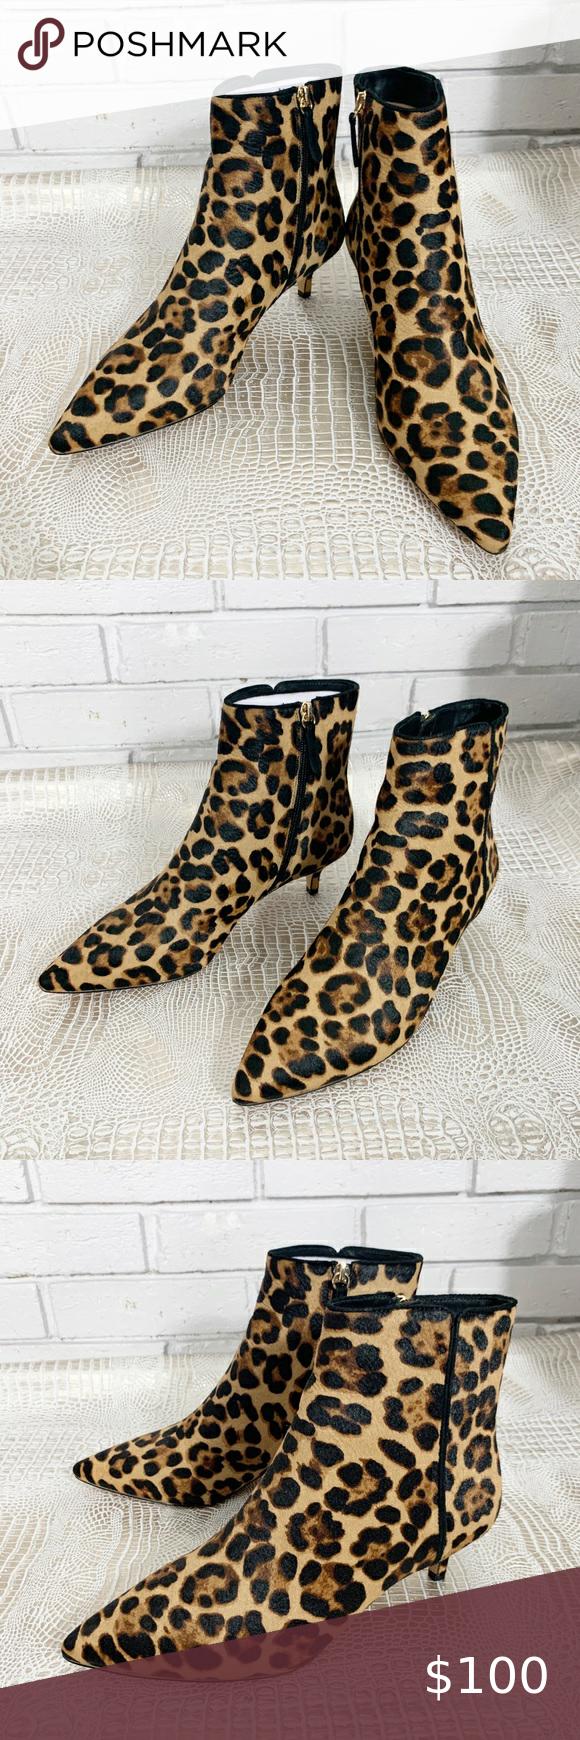 J Crew Fiona Kitten Heel Ankle Boots In Leopard In 2020 Kitten Heel Ankle Boots Heeled Ankle Boots Ankle Boots